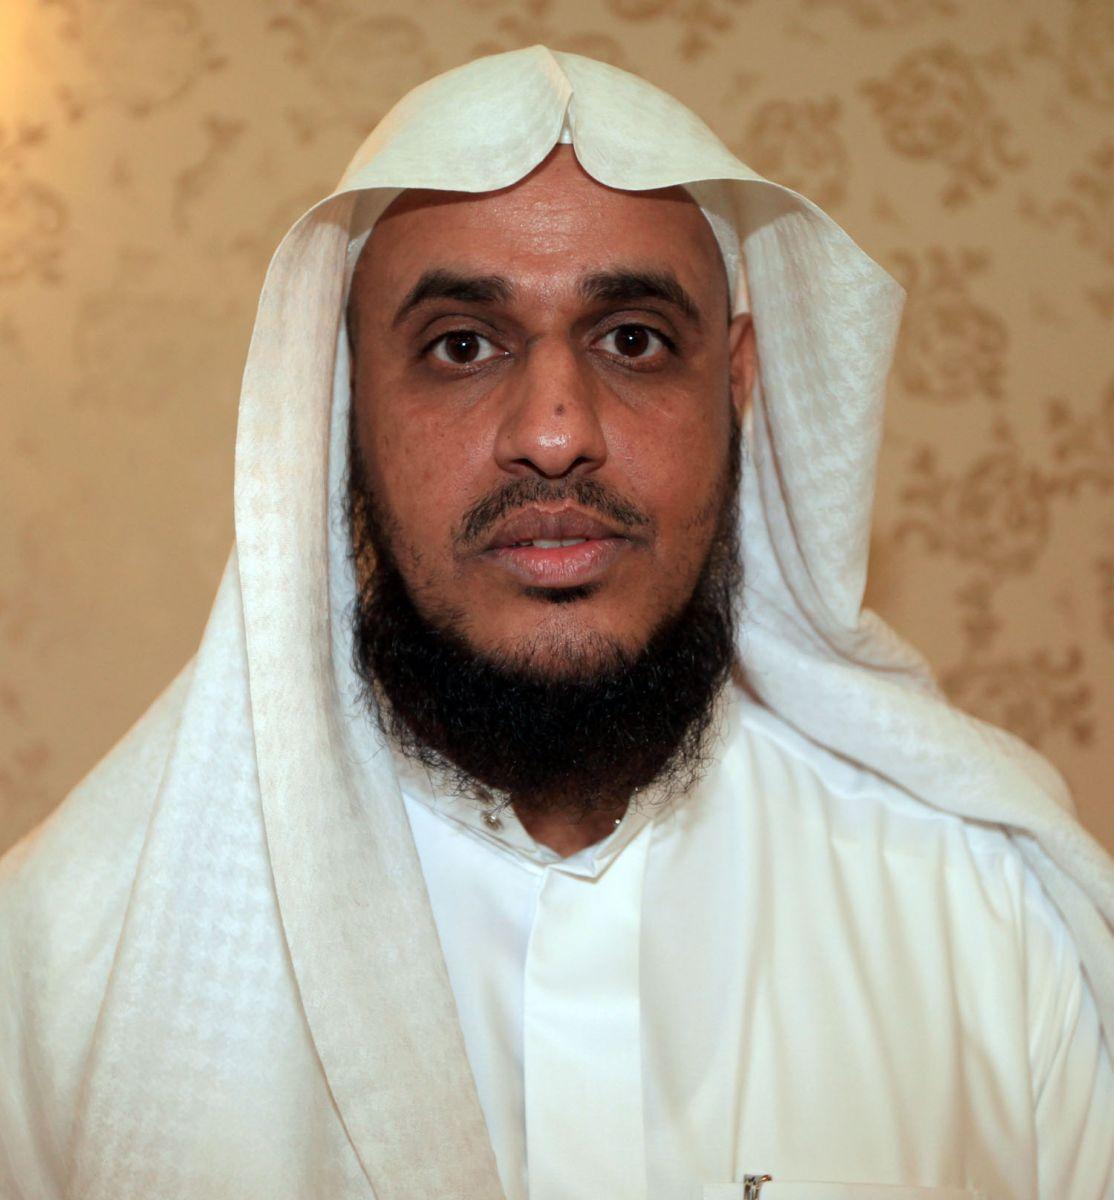 Reciter Jumaan Hamud Al-Usaimi